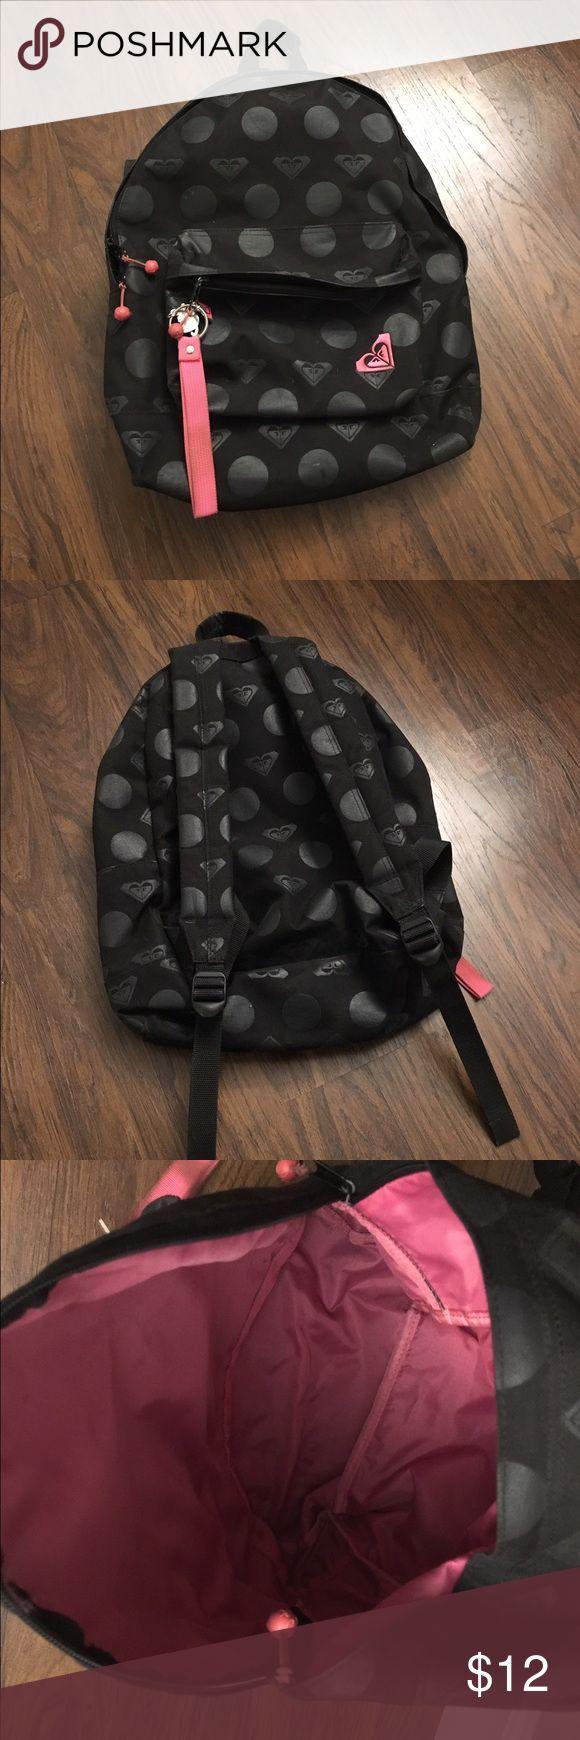 Final markdown! ROXY backpack Pre-loved ROXY backpack Roxy Bags Backpacks